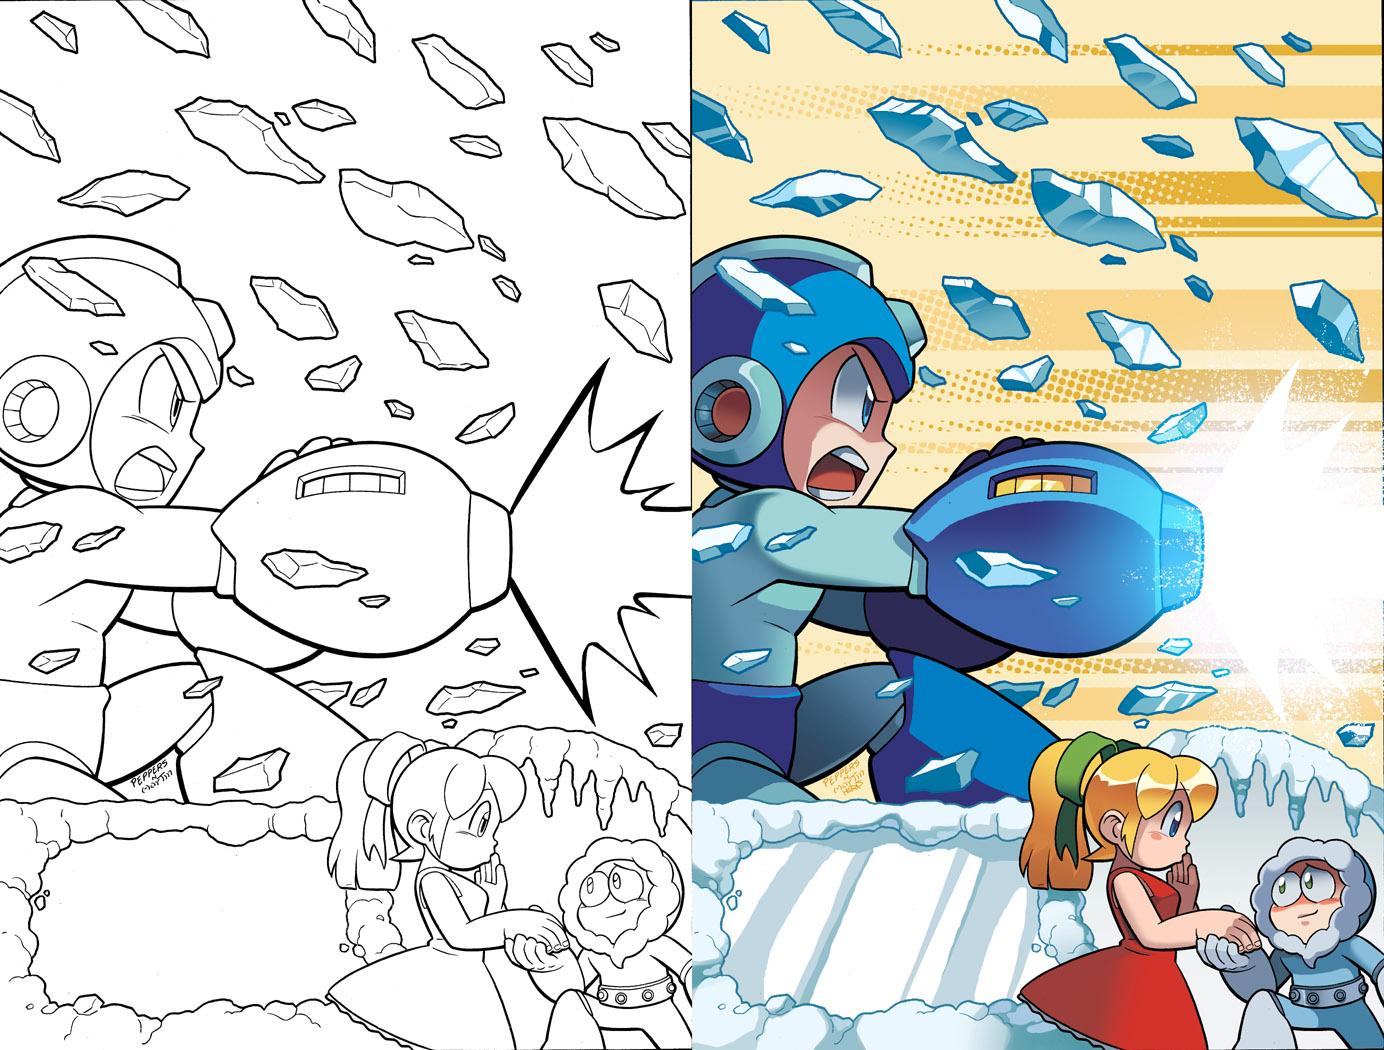 mega man 22 cover by herms85 iceman coloring sheets comics pinterest - Mega Man Printable Coloring Pages